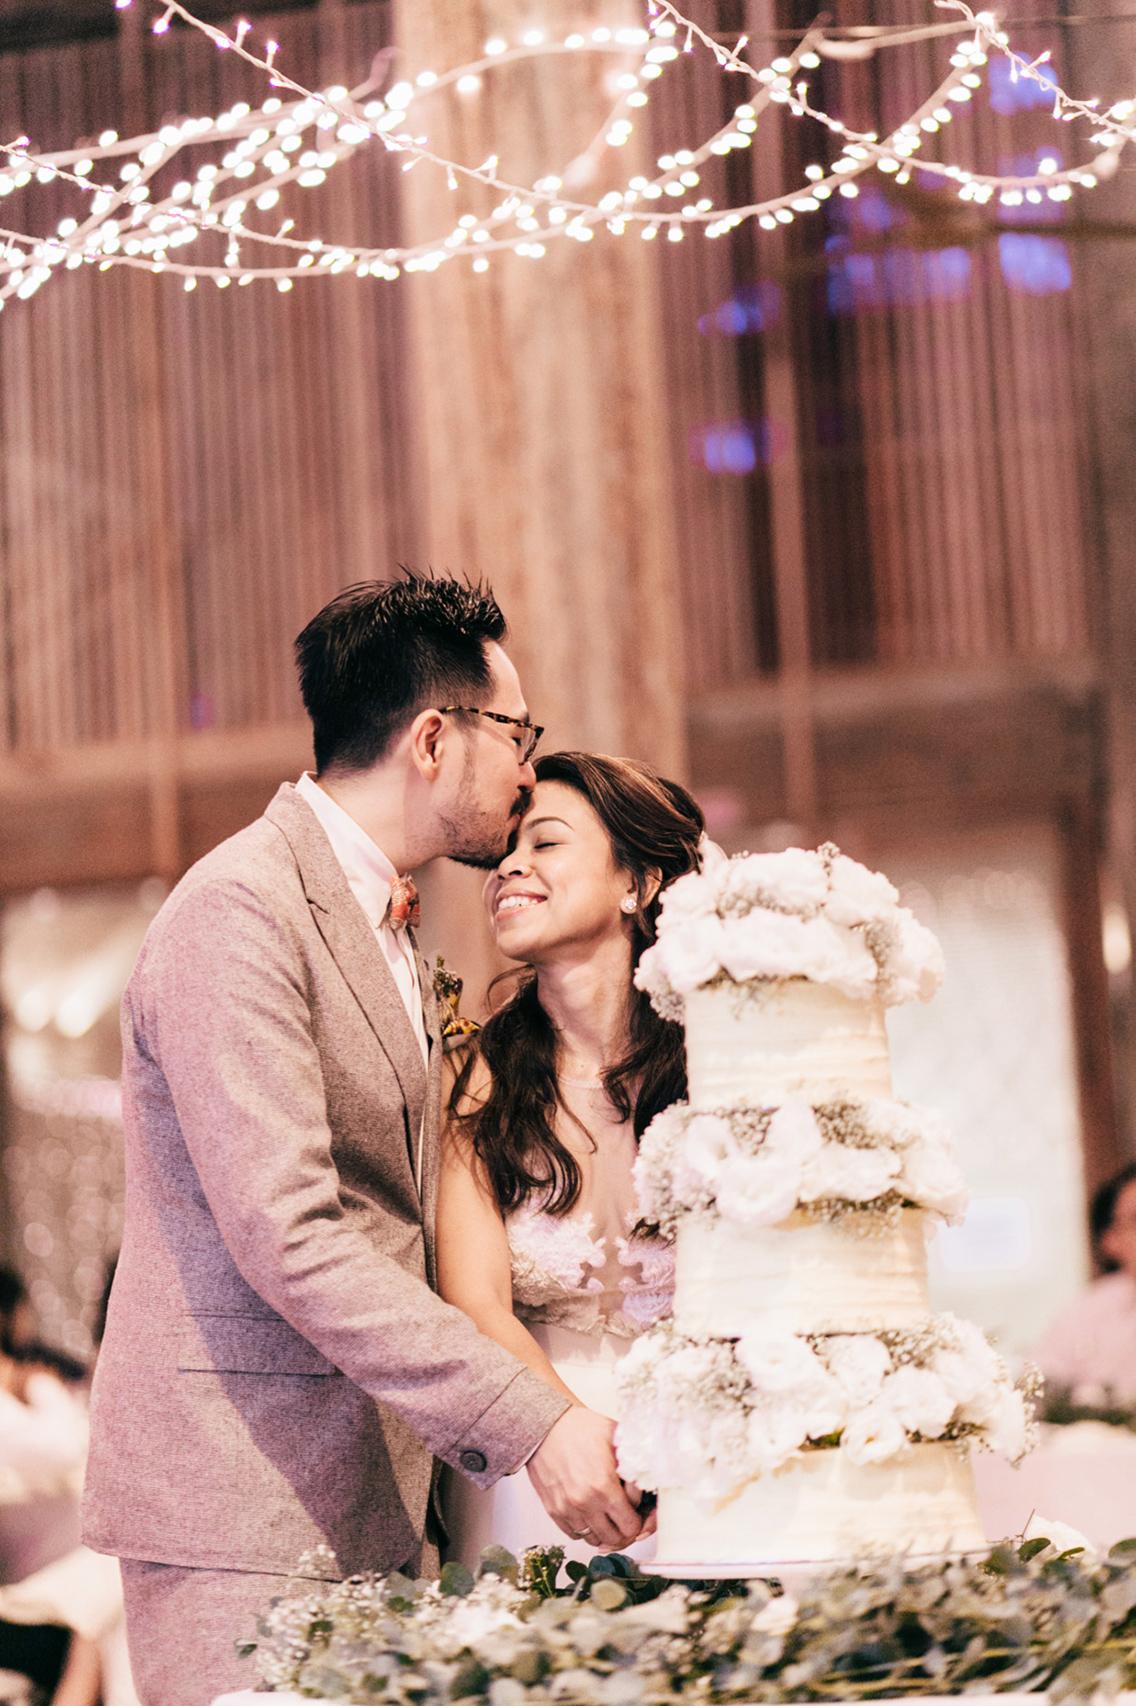 76-hellojanelee-tanarimba-janda-baik-wedding-tj-suzi-malaysia